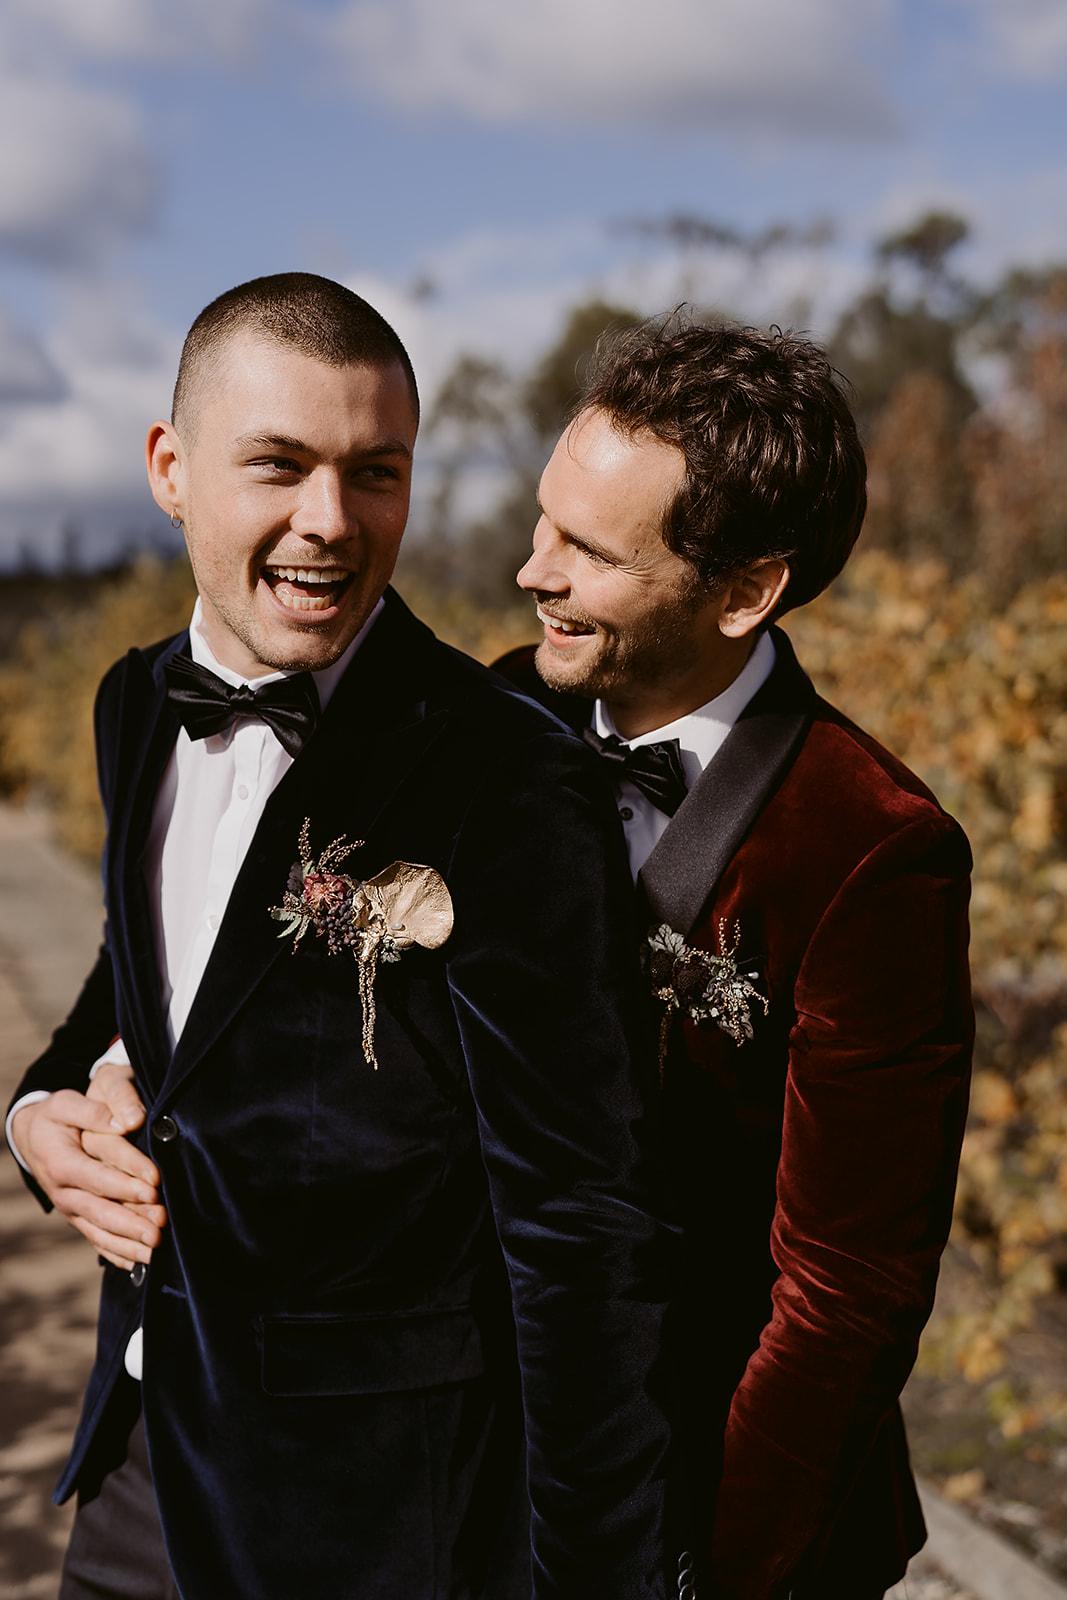 Immerse_Yarra_Valley_Same_Sex_Wedding_-_Ashleigh_Haase_Photography-367.jpg